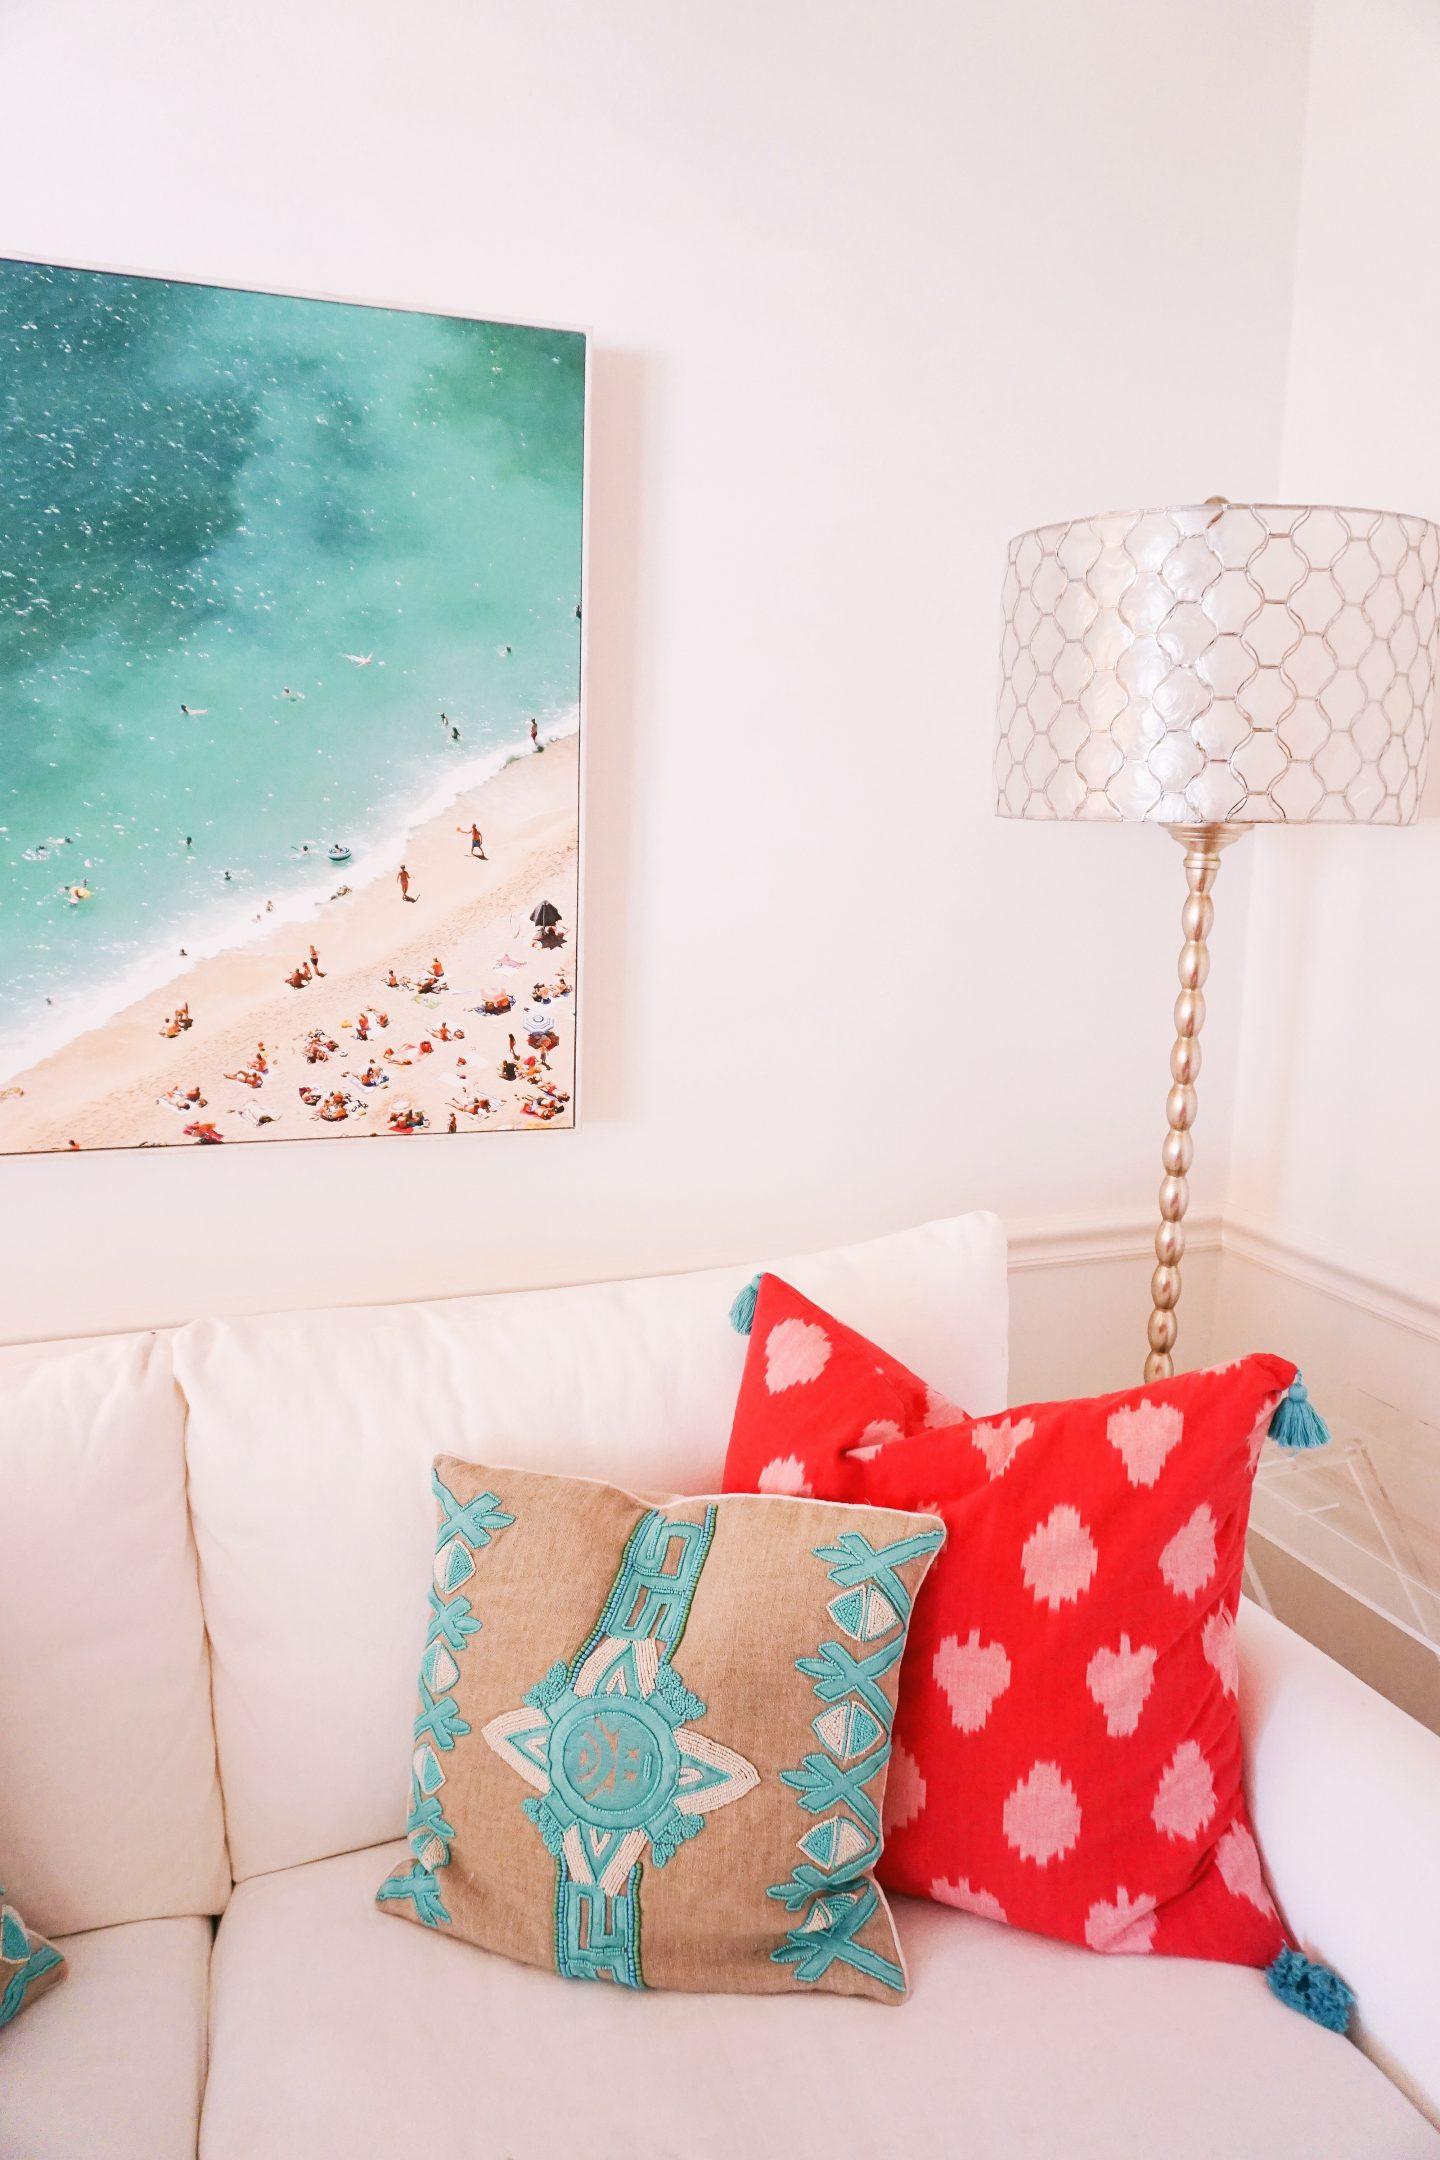 Vero Beach Townhouse sofa